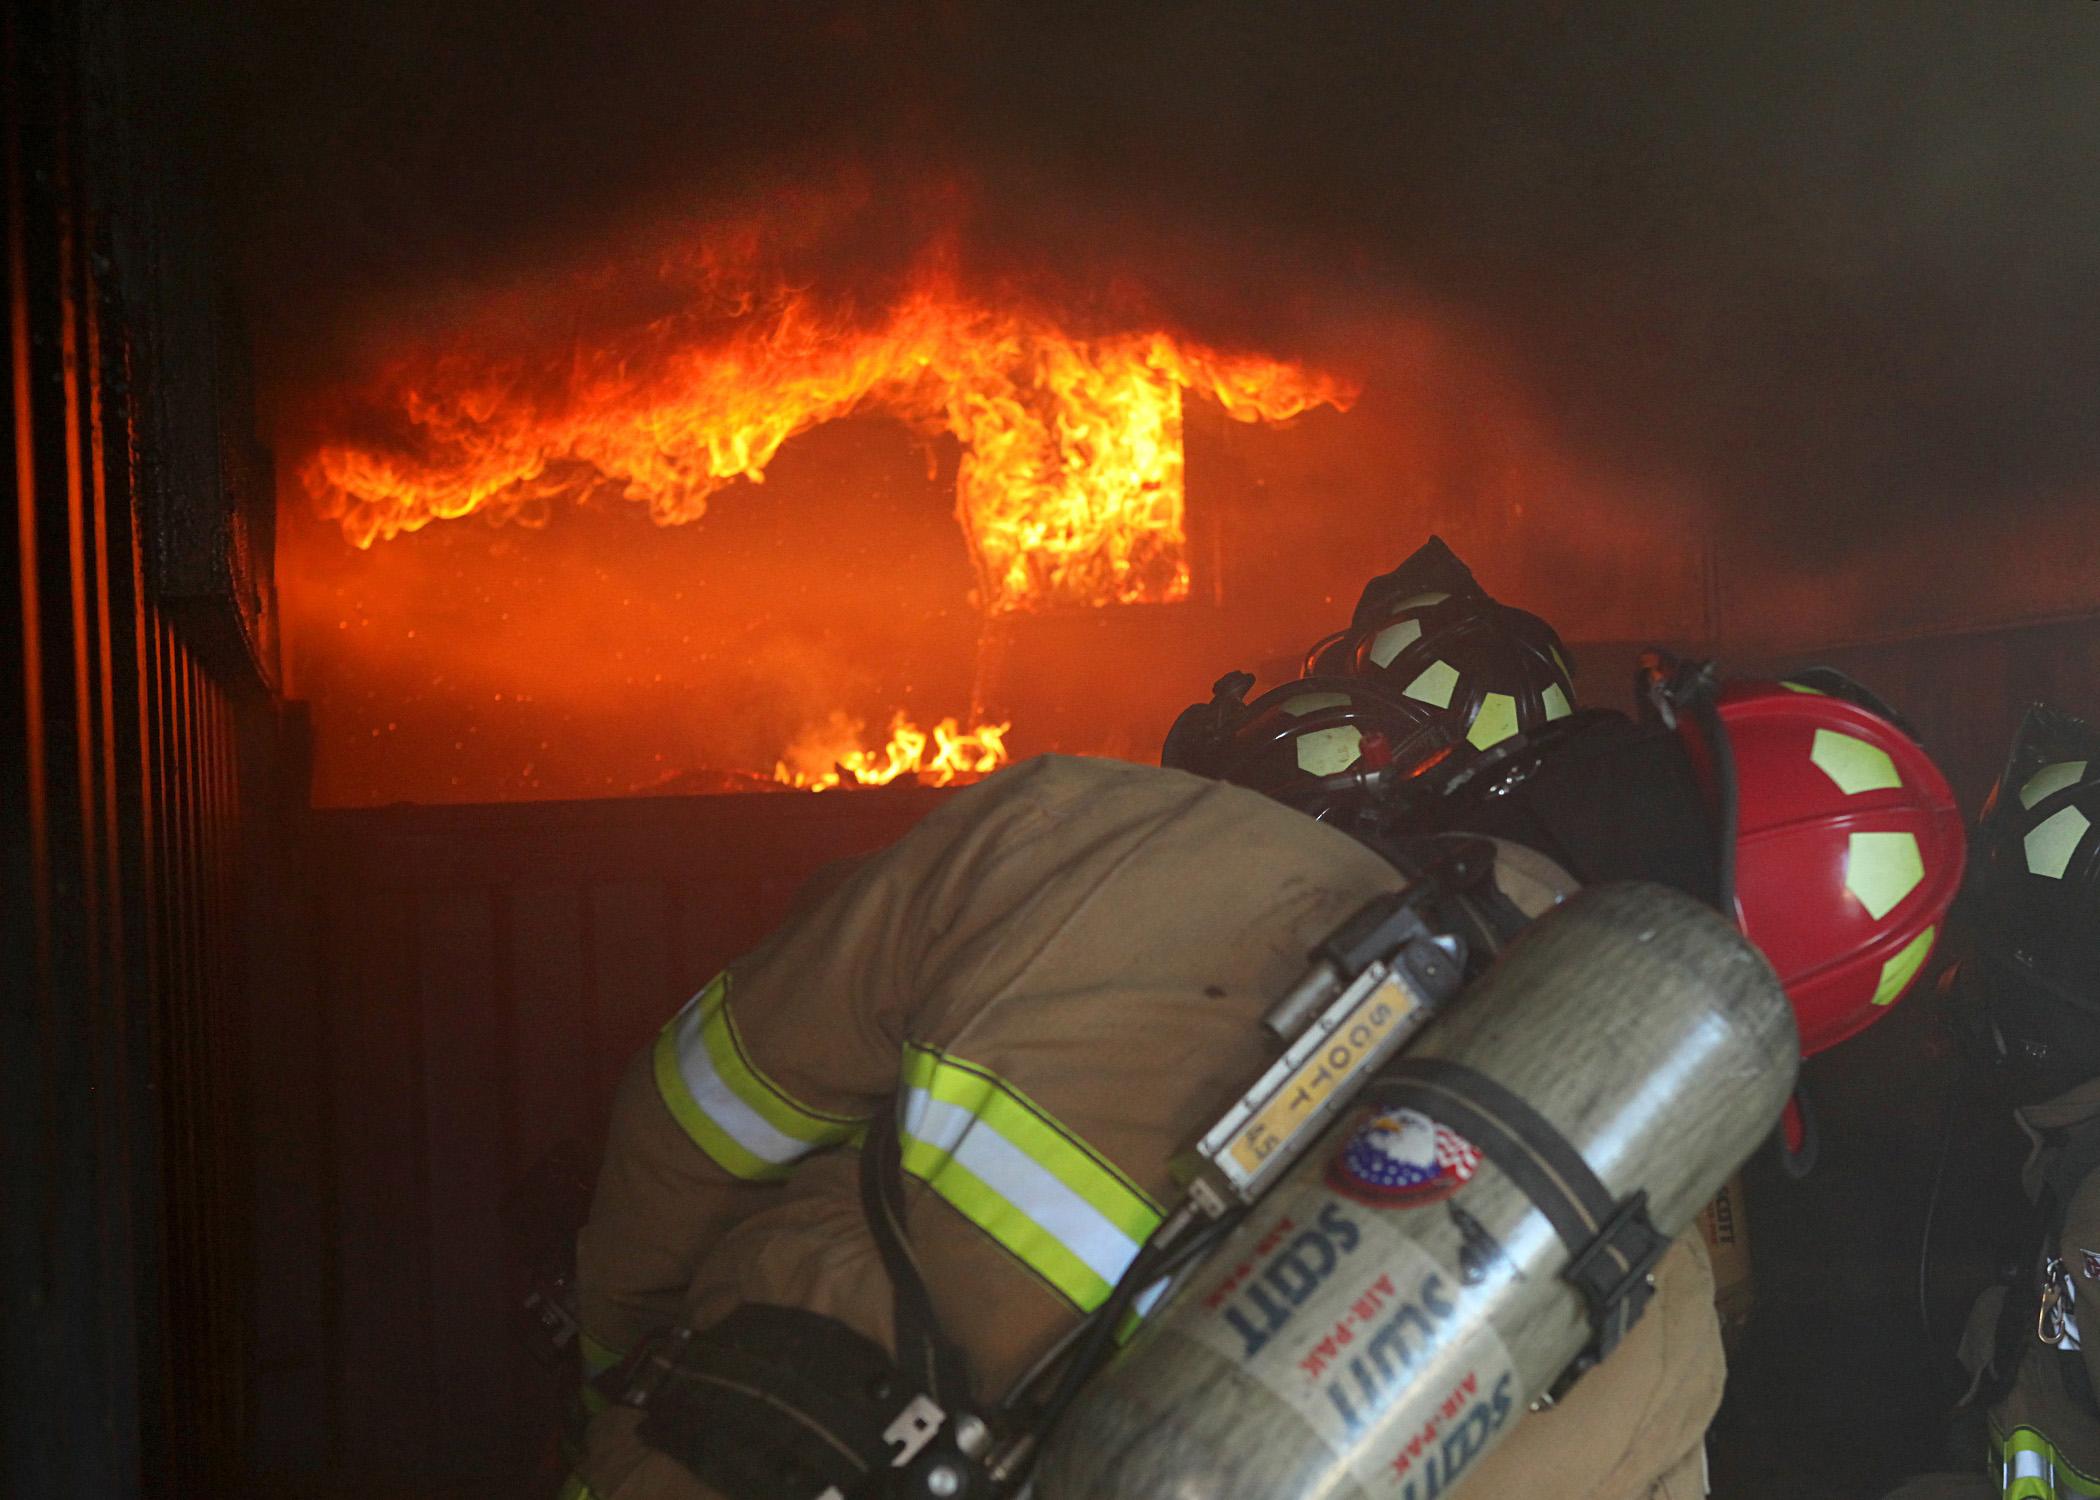 jbsa firemen take flashover training  u0026gt  joint base san antonio  u0026gt  news